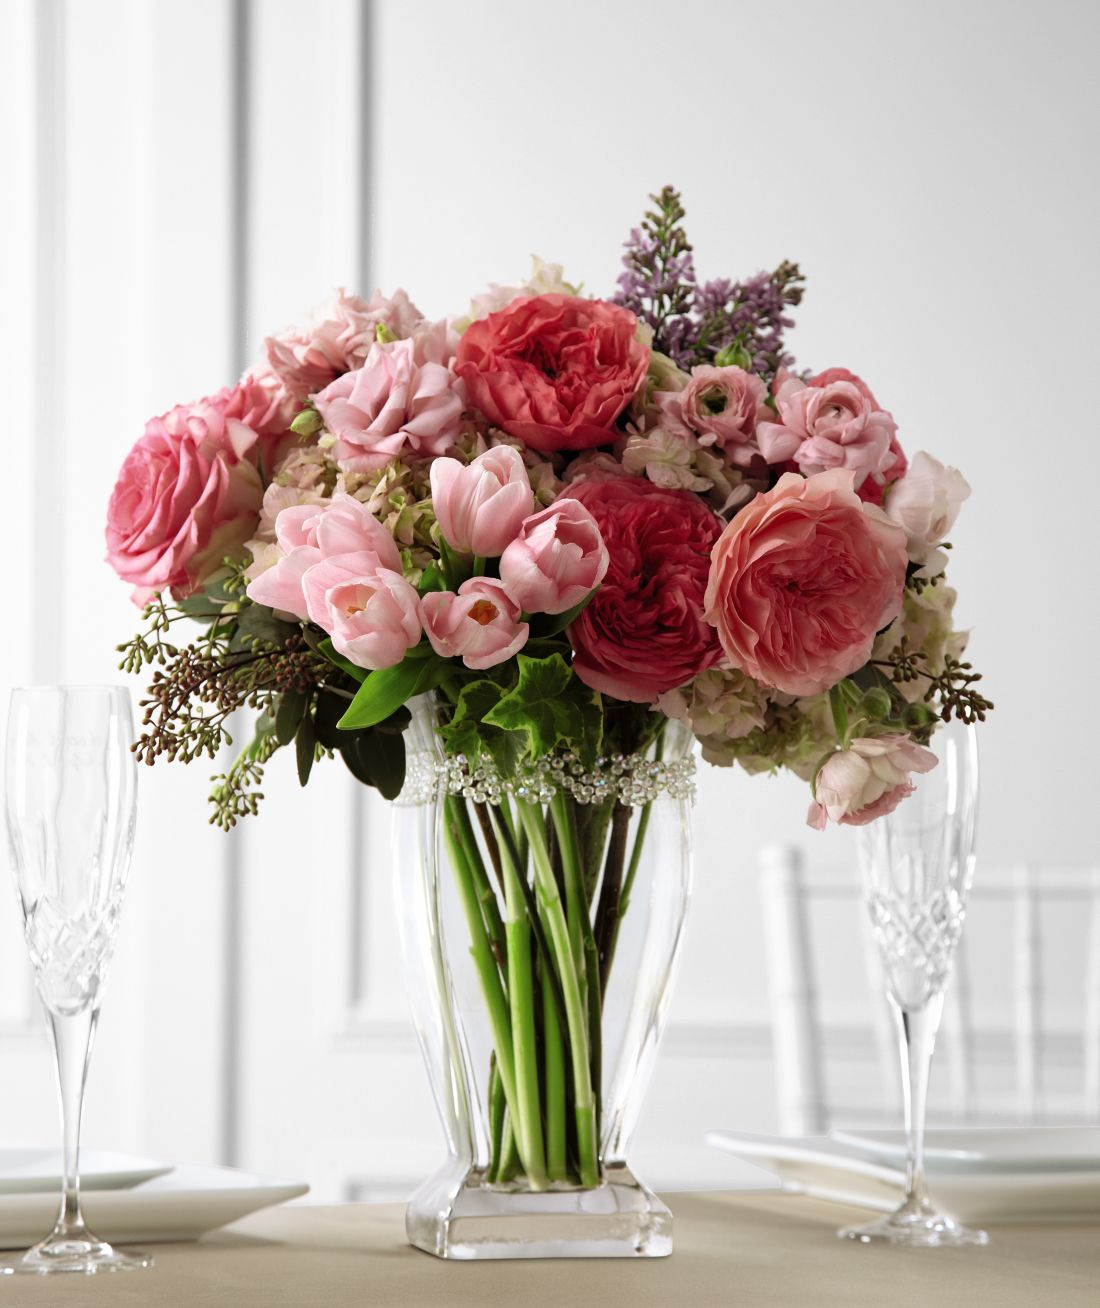 The FTD® Abundant Array™ Arrangement is full of romantic intrigue ...